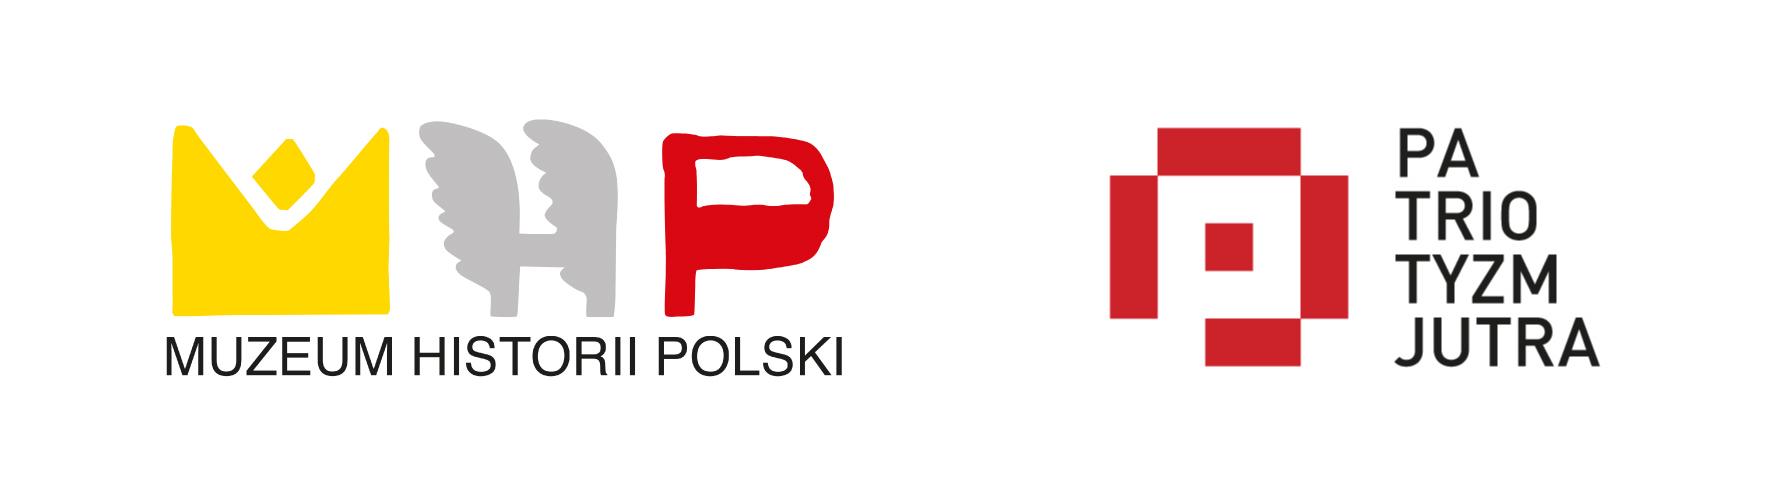 pj-mhp